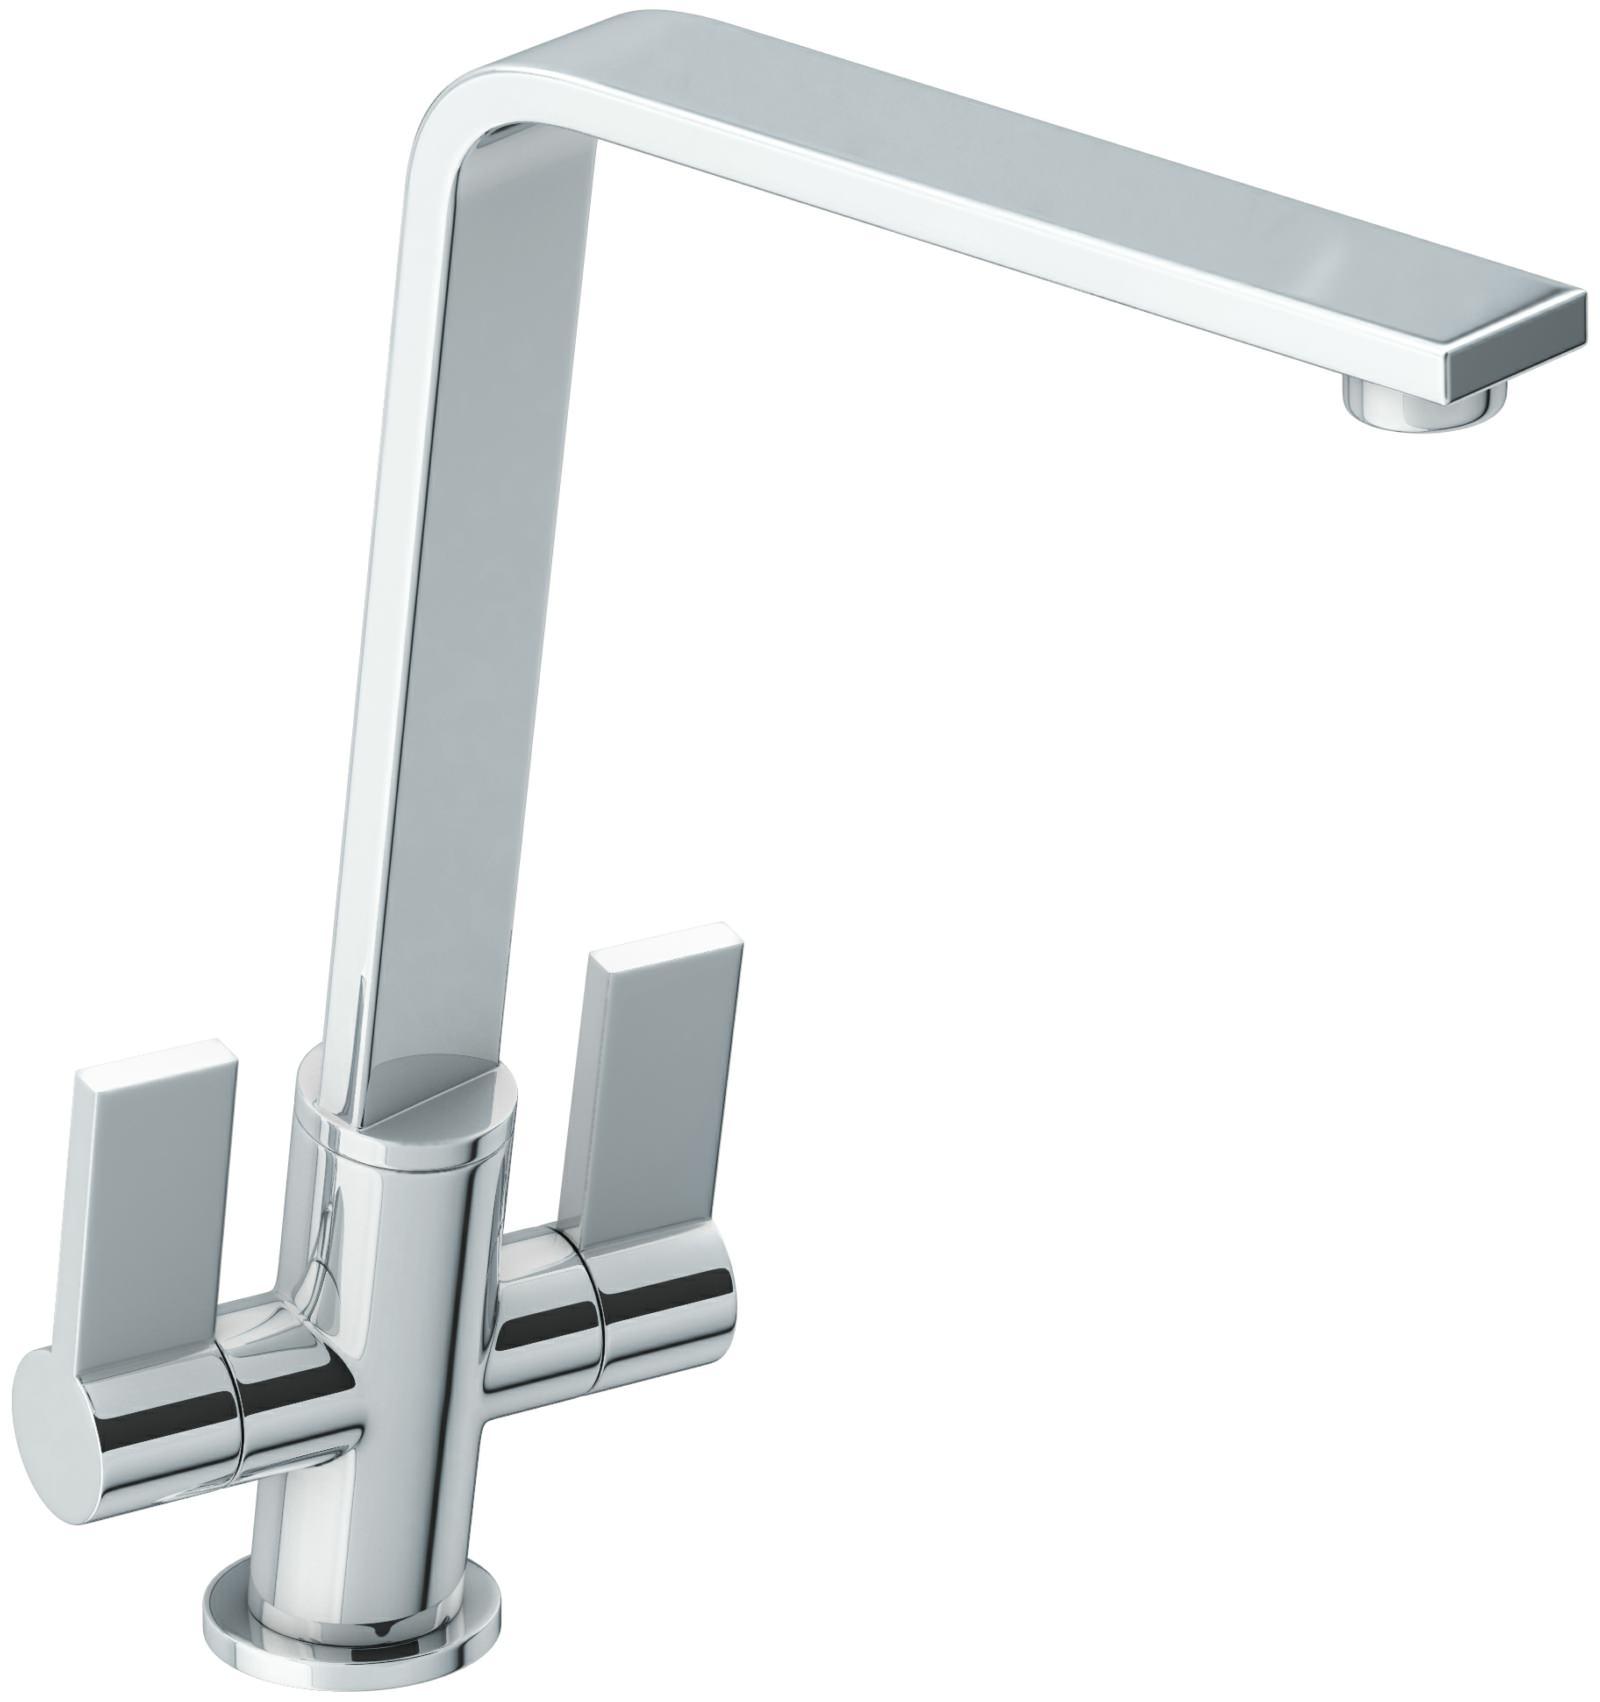 White Monobloc Kitchen Taps Abode Linear Flair Chrome Monobloc Kitchen Mixer Tap At1220